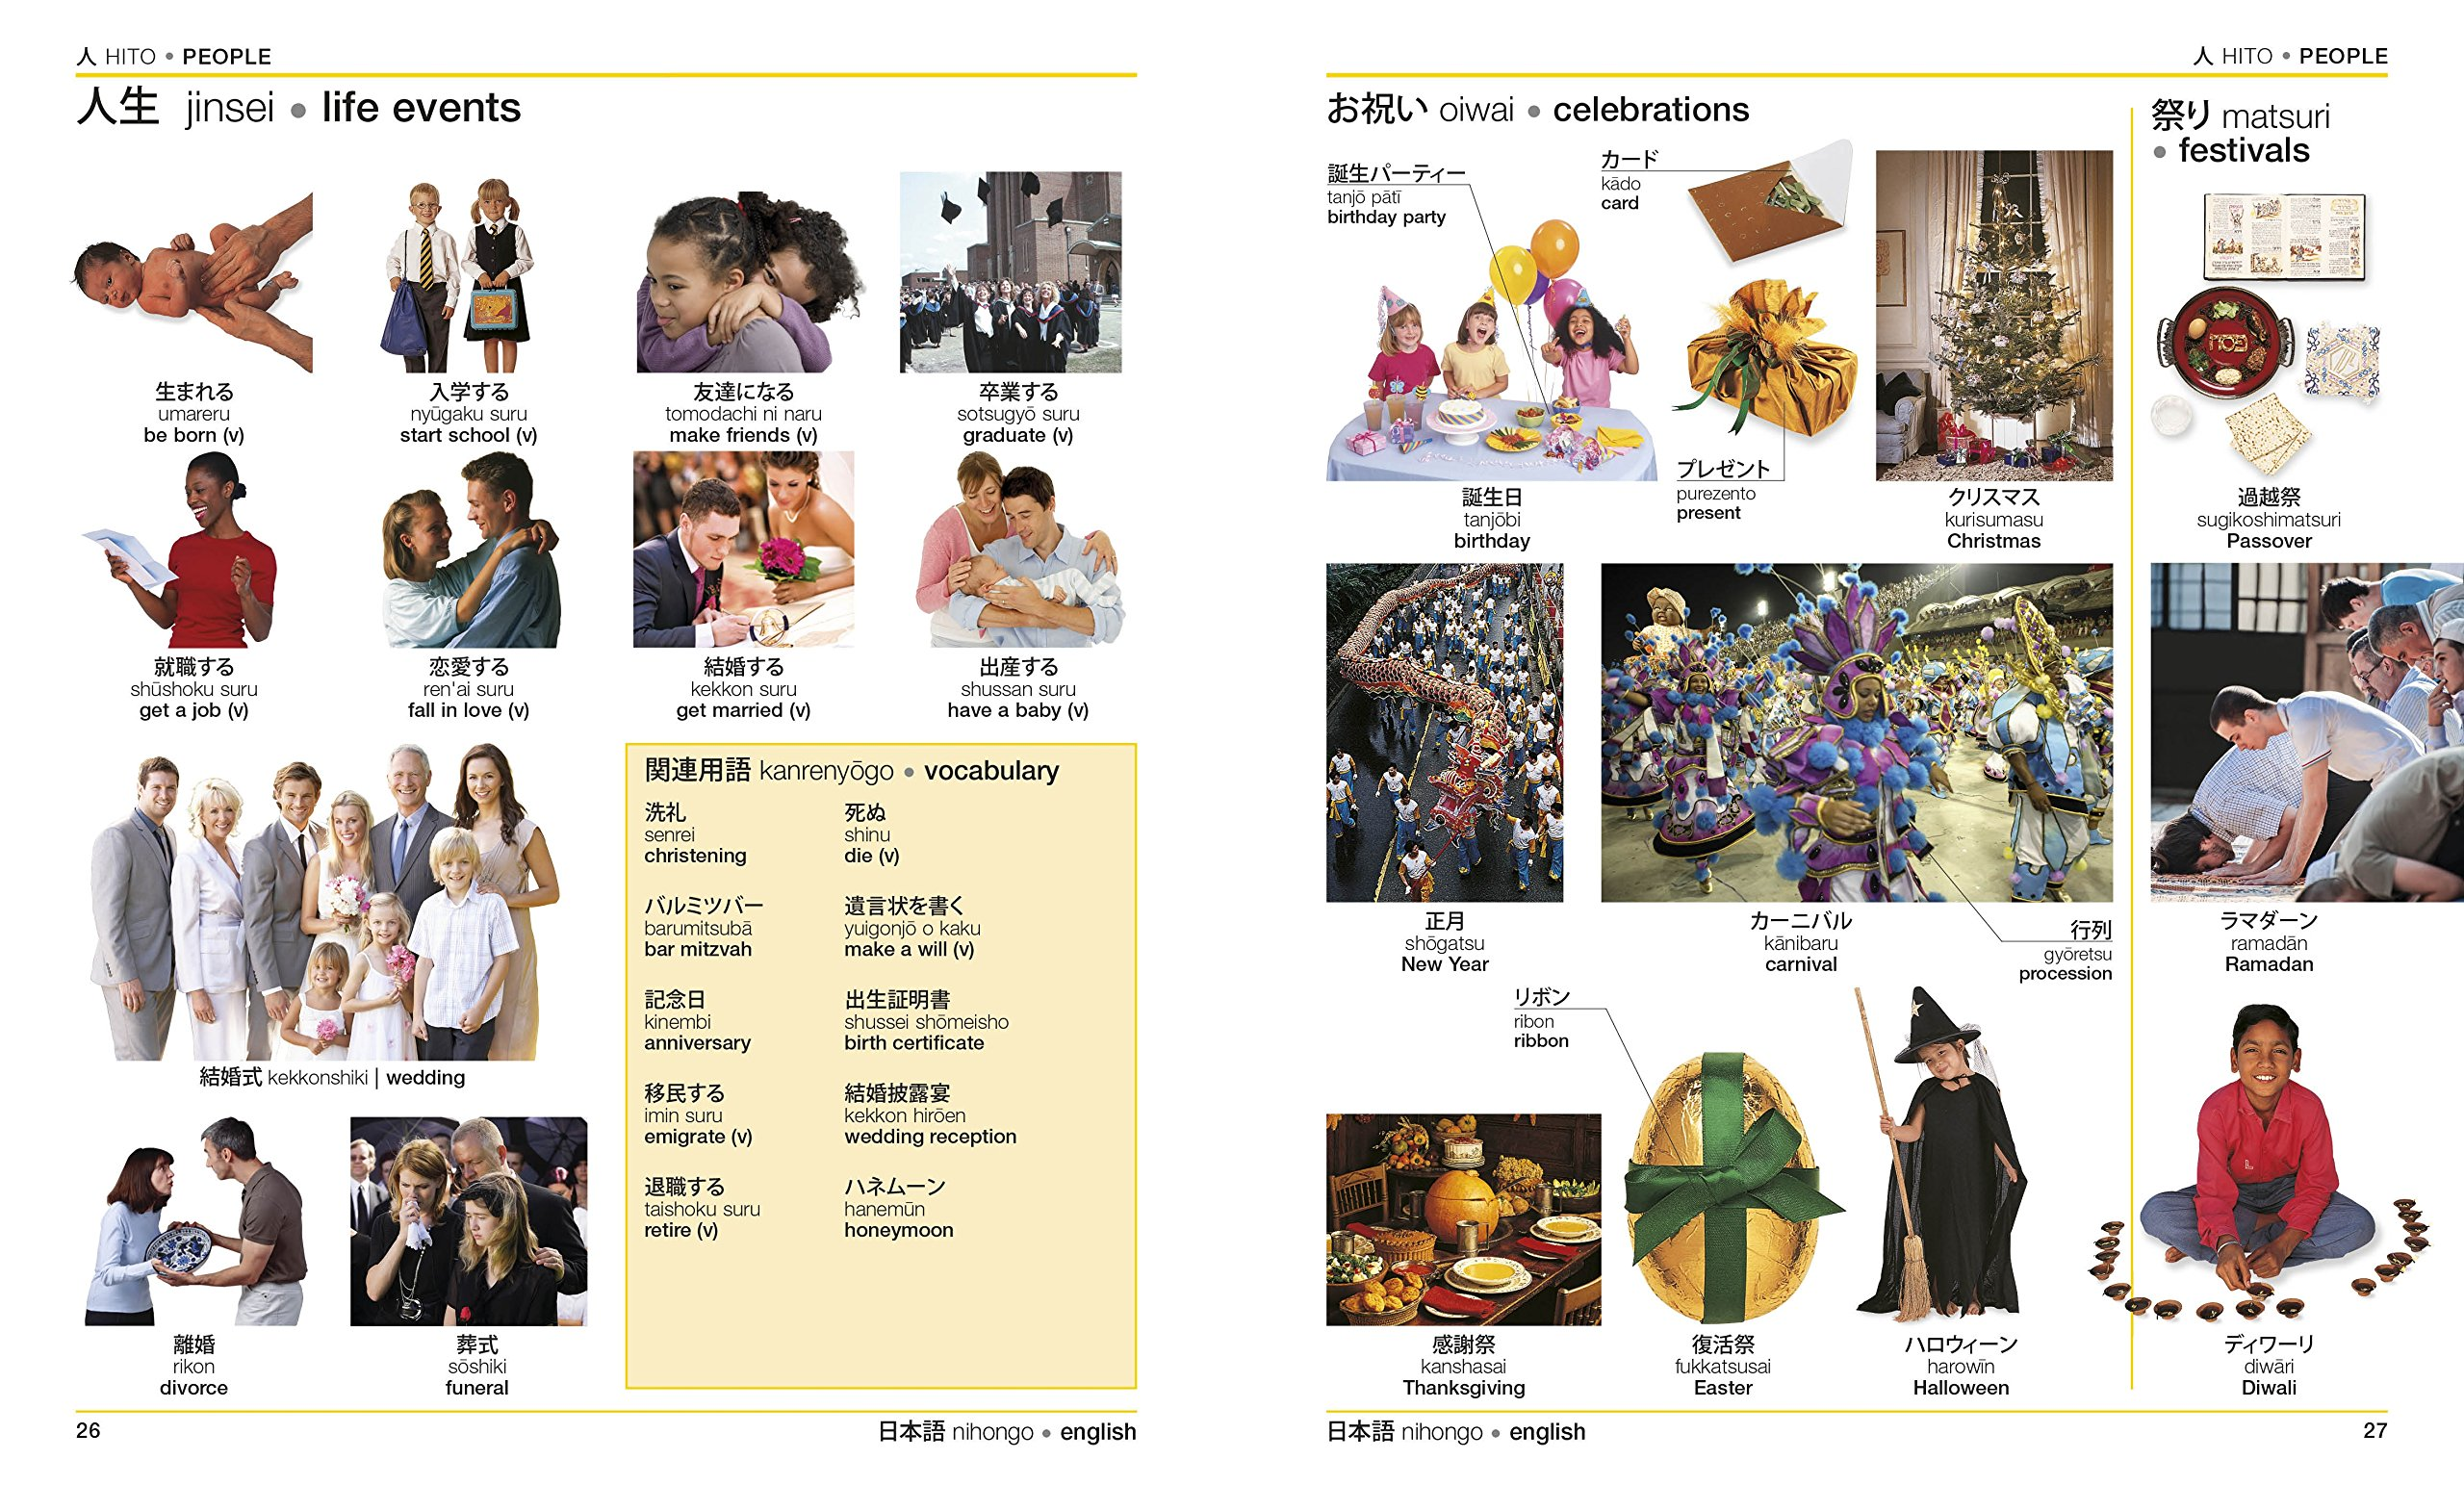 Japanese english bilingual visual dictionary dk visual dictionaries dk 9781465443823 amazon com books